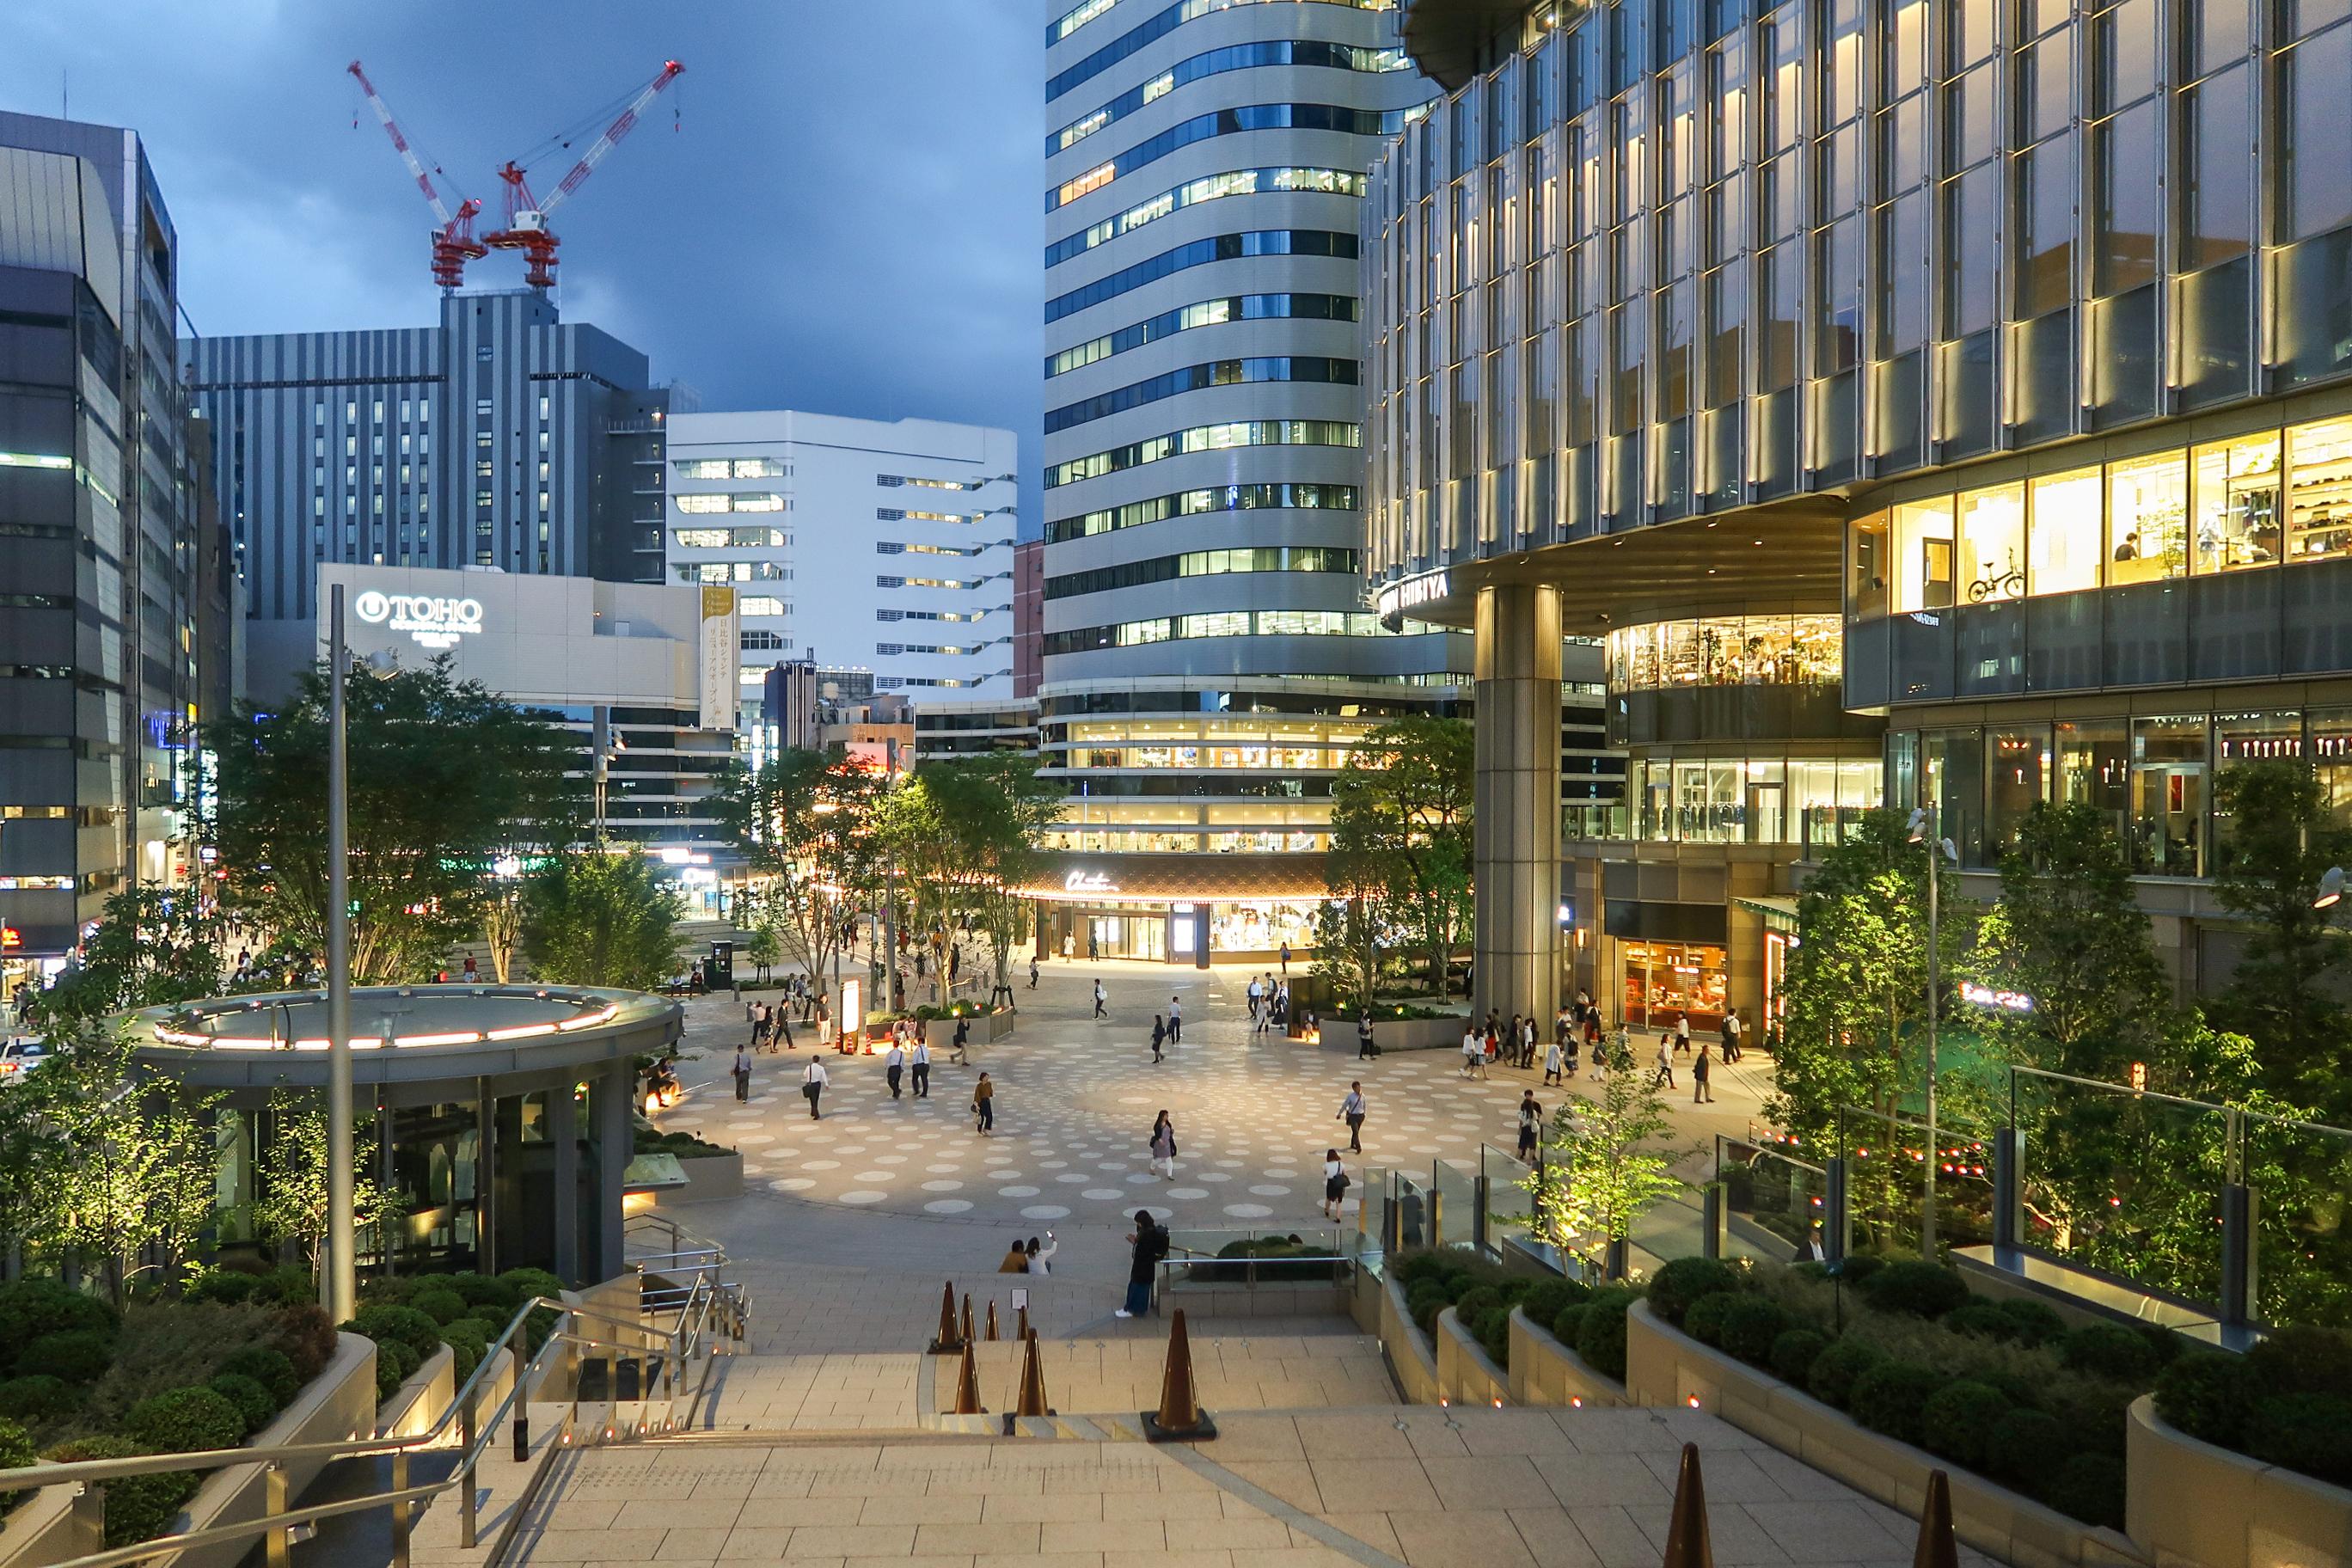 「tokyo midtown」的圖片搜尋結果